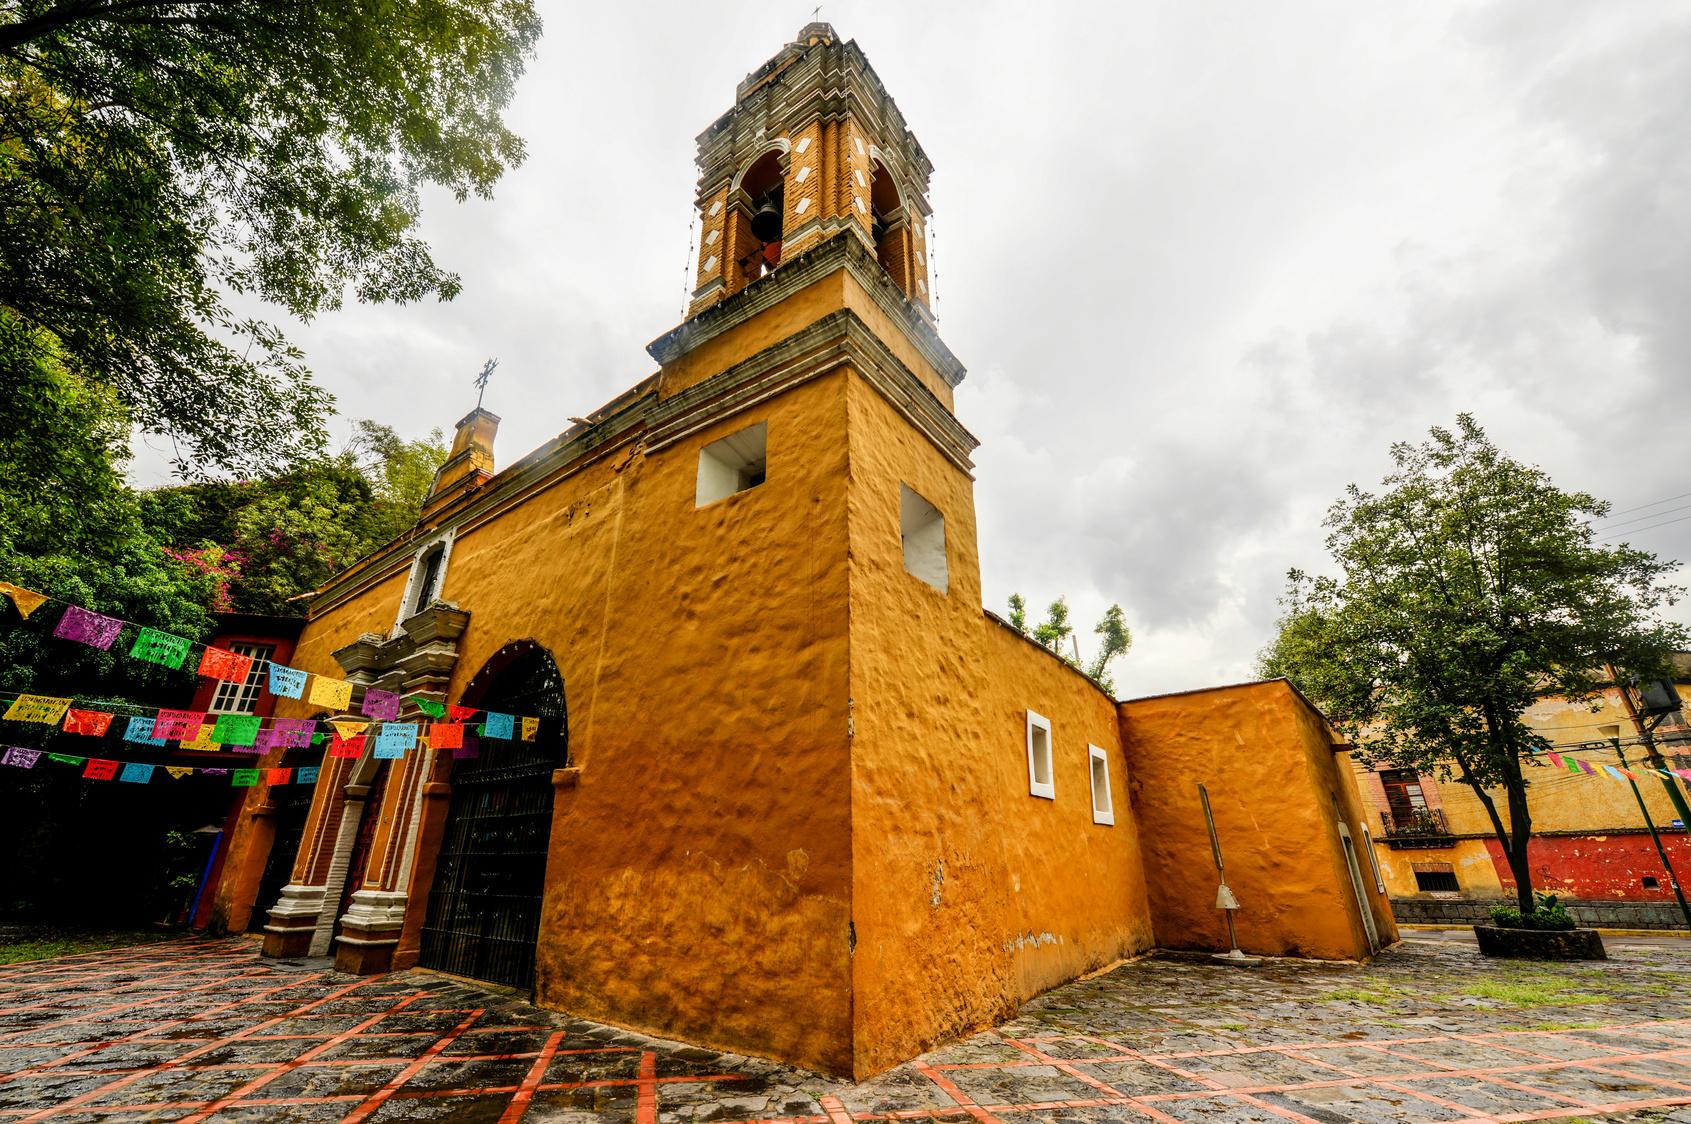 Visiter Coyoacan à Mexico